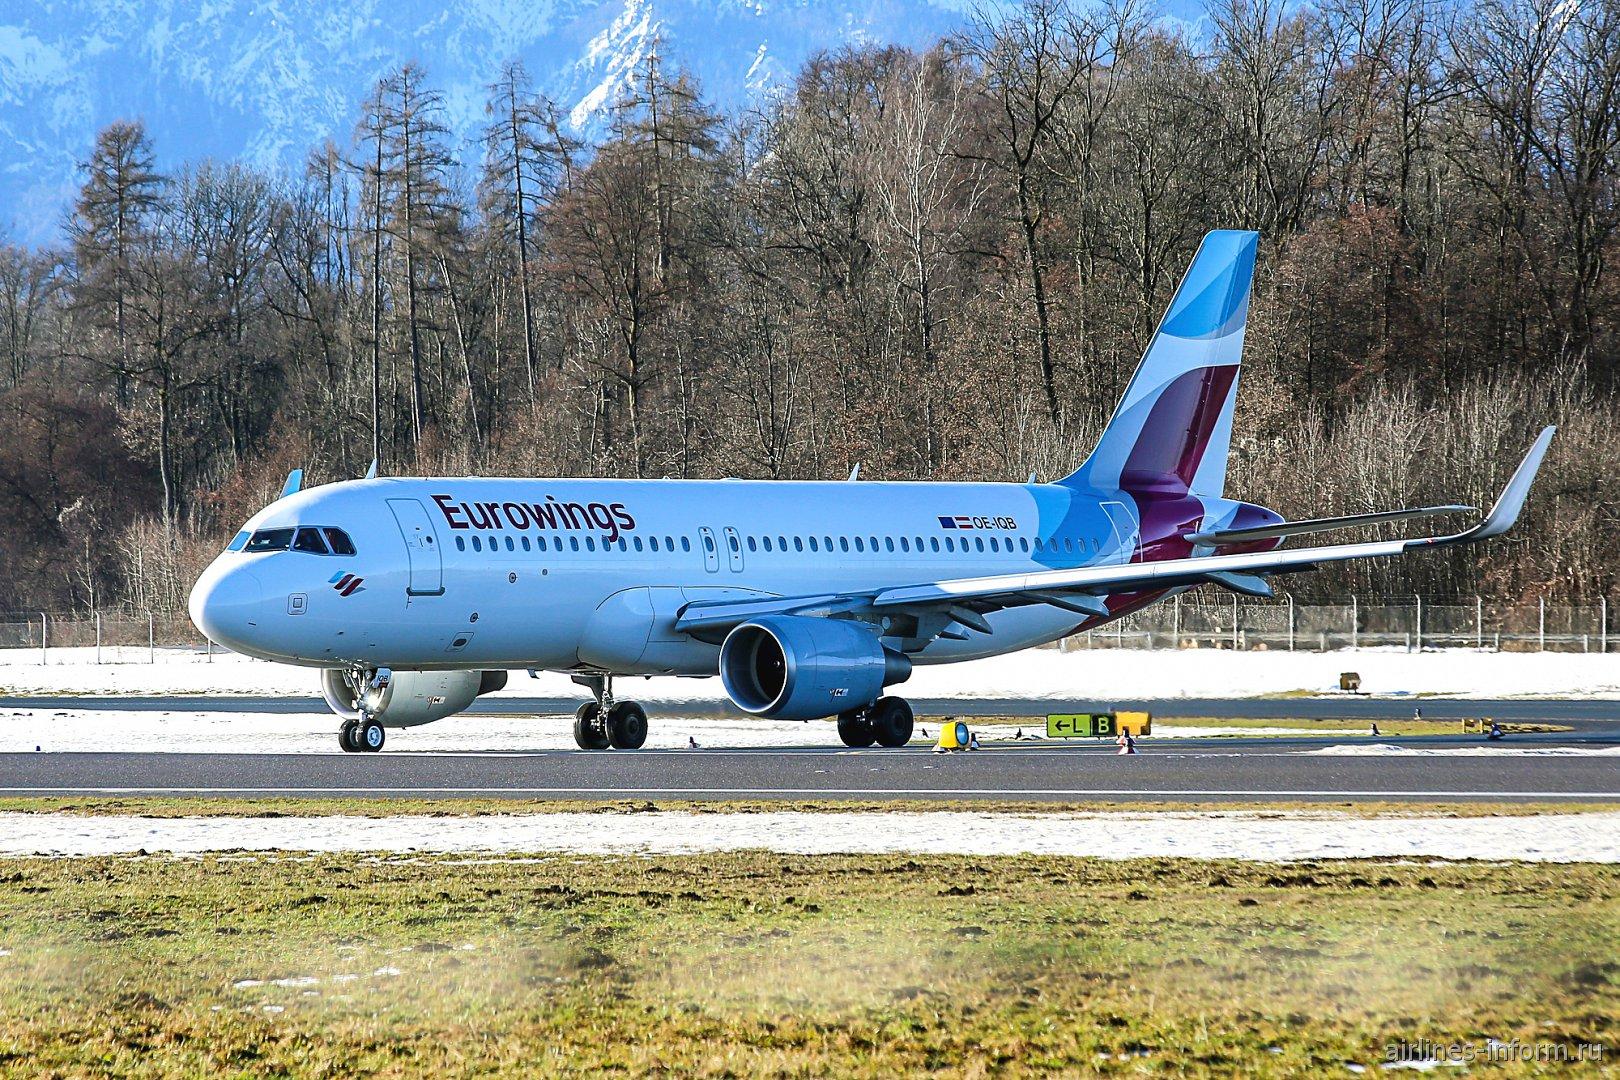 Airbus A320 OE-IQB авиакомпании Eurowings готовится к взлету в аэропорту Зальцбурга